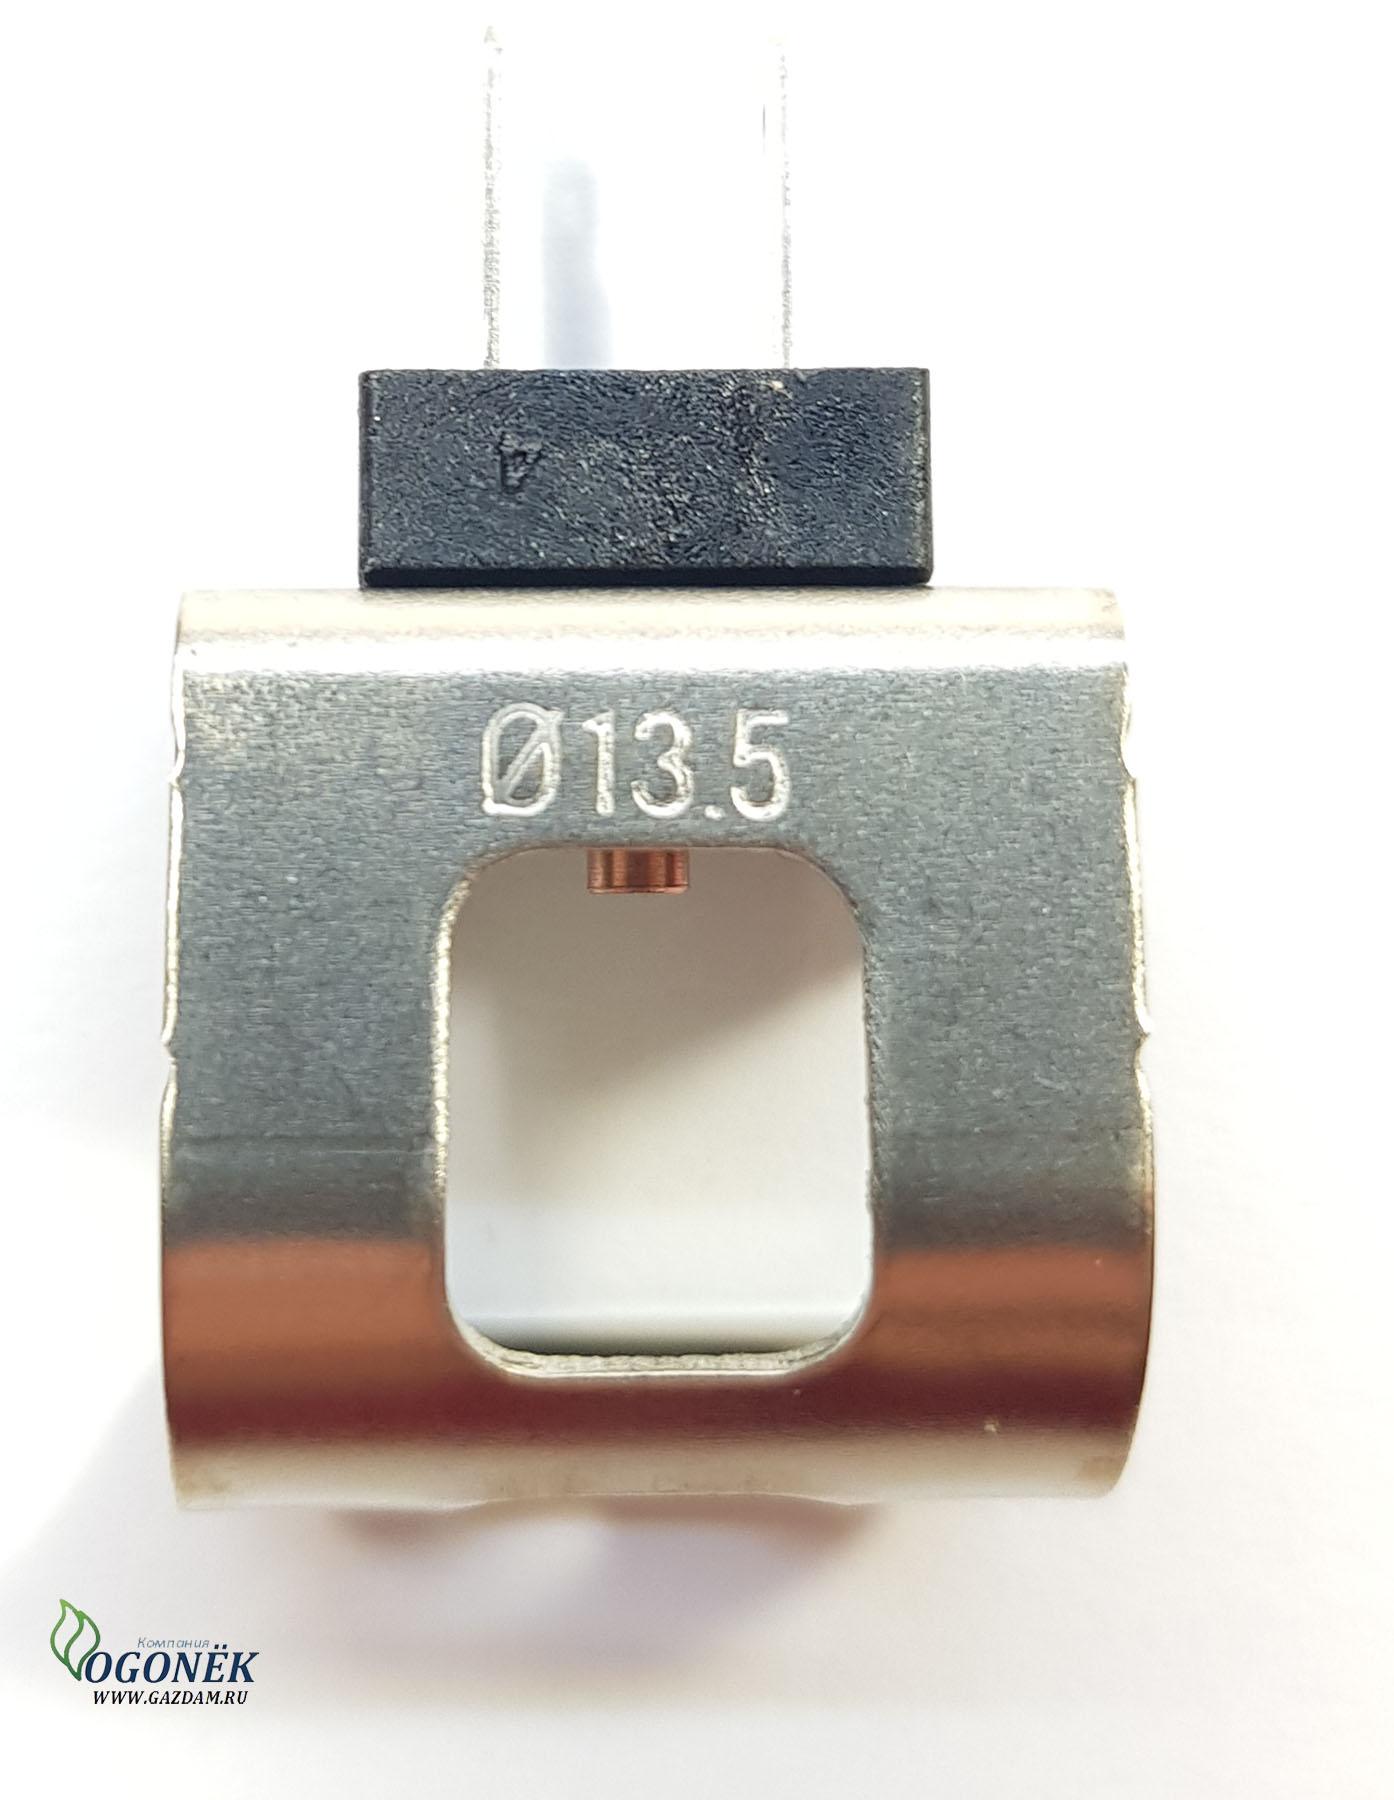 6SONDNTC07 NTC - Датчик NTC D13.5